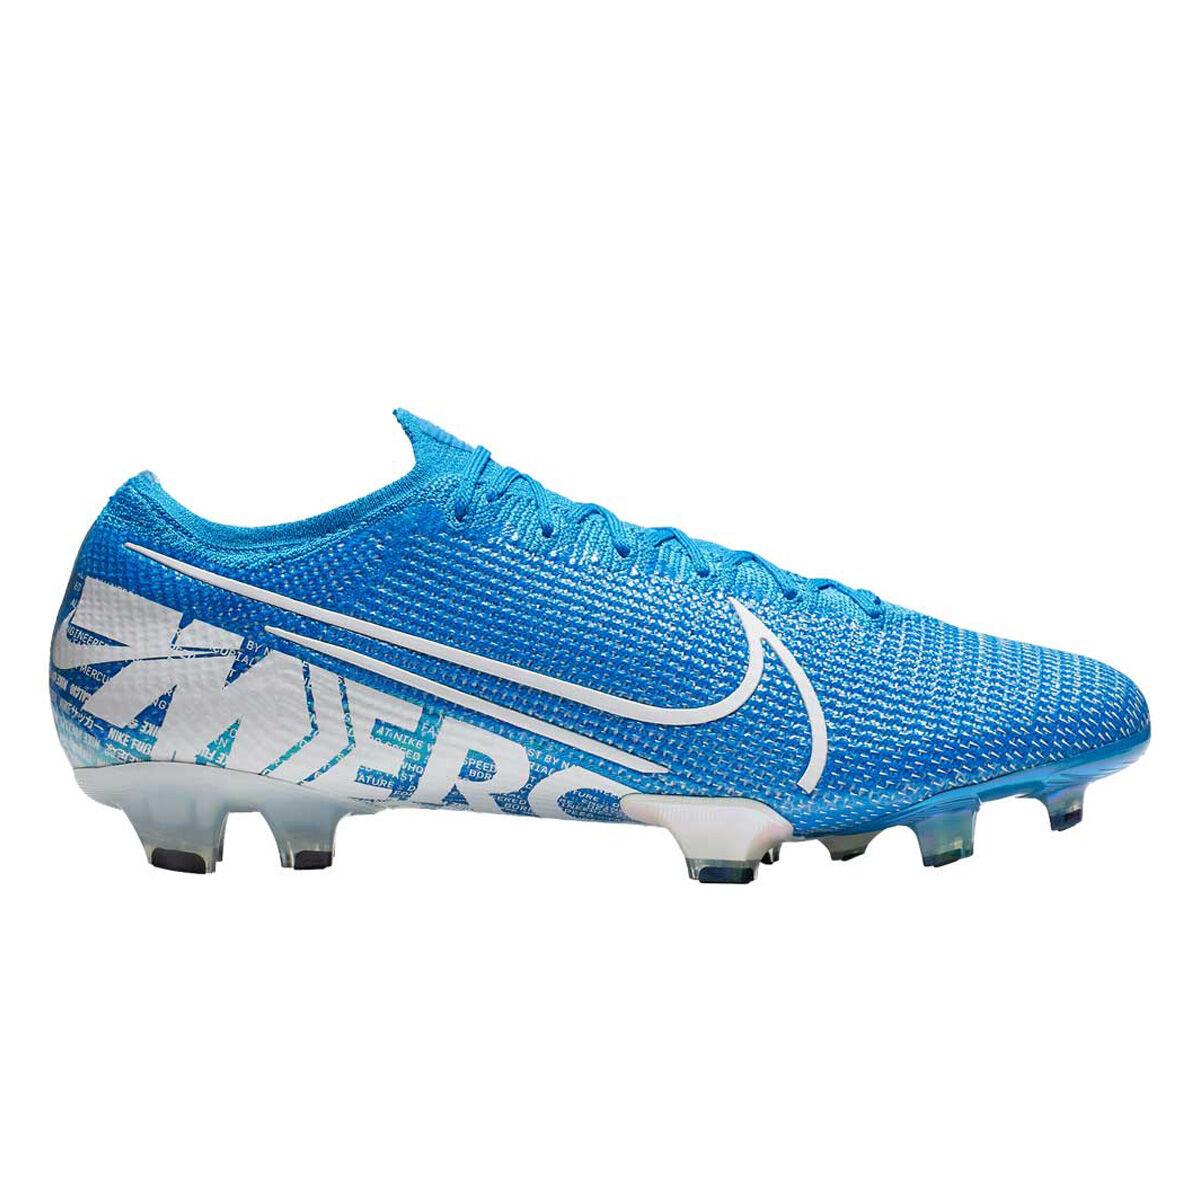 Nike Mercurial Vapor XIII Elite Football Boots